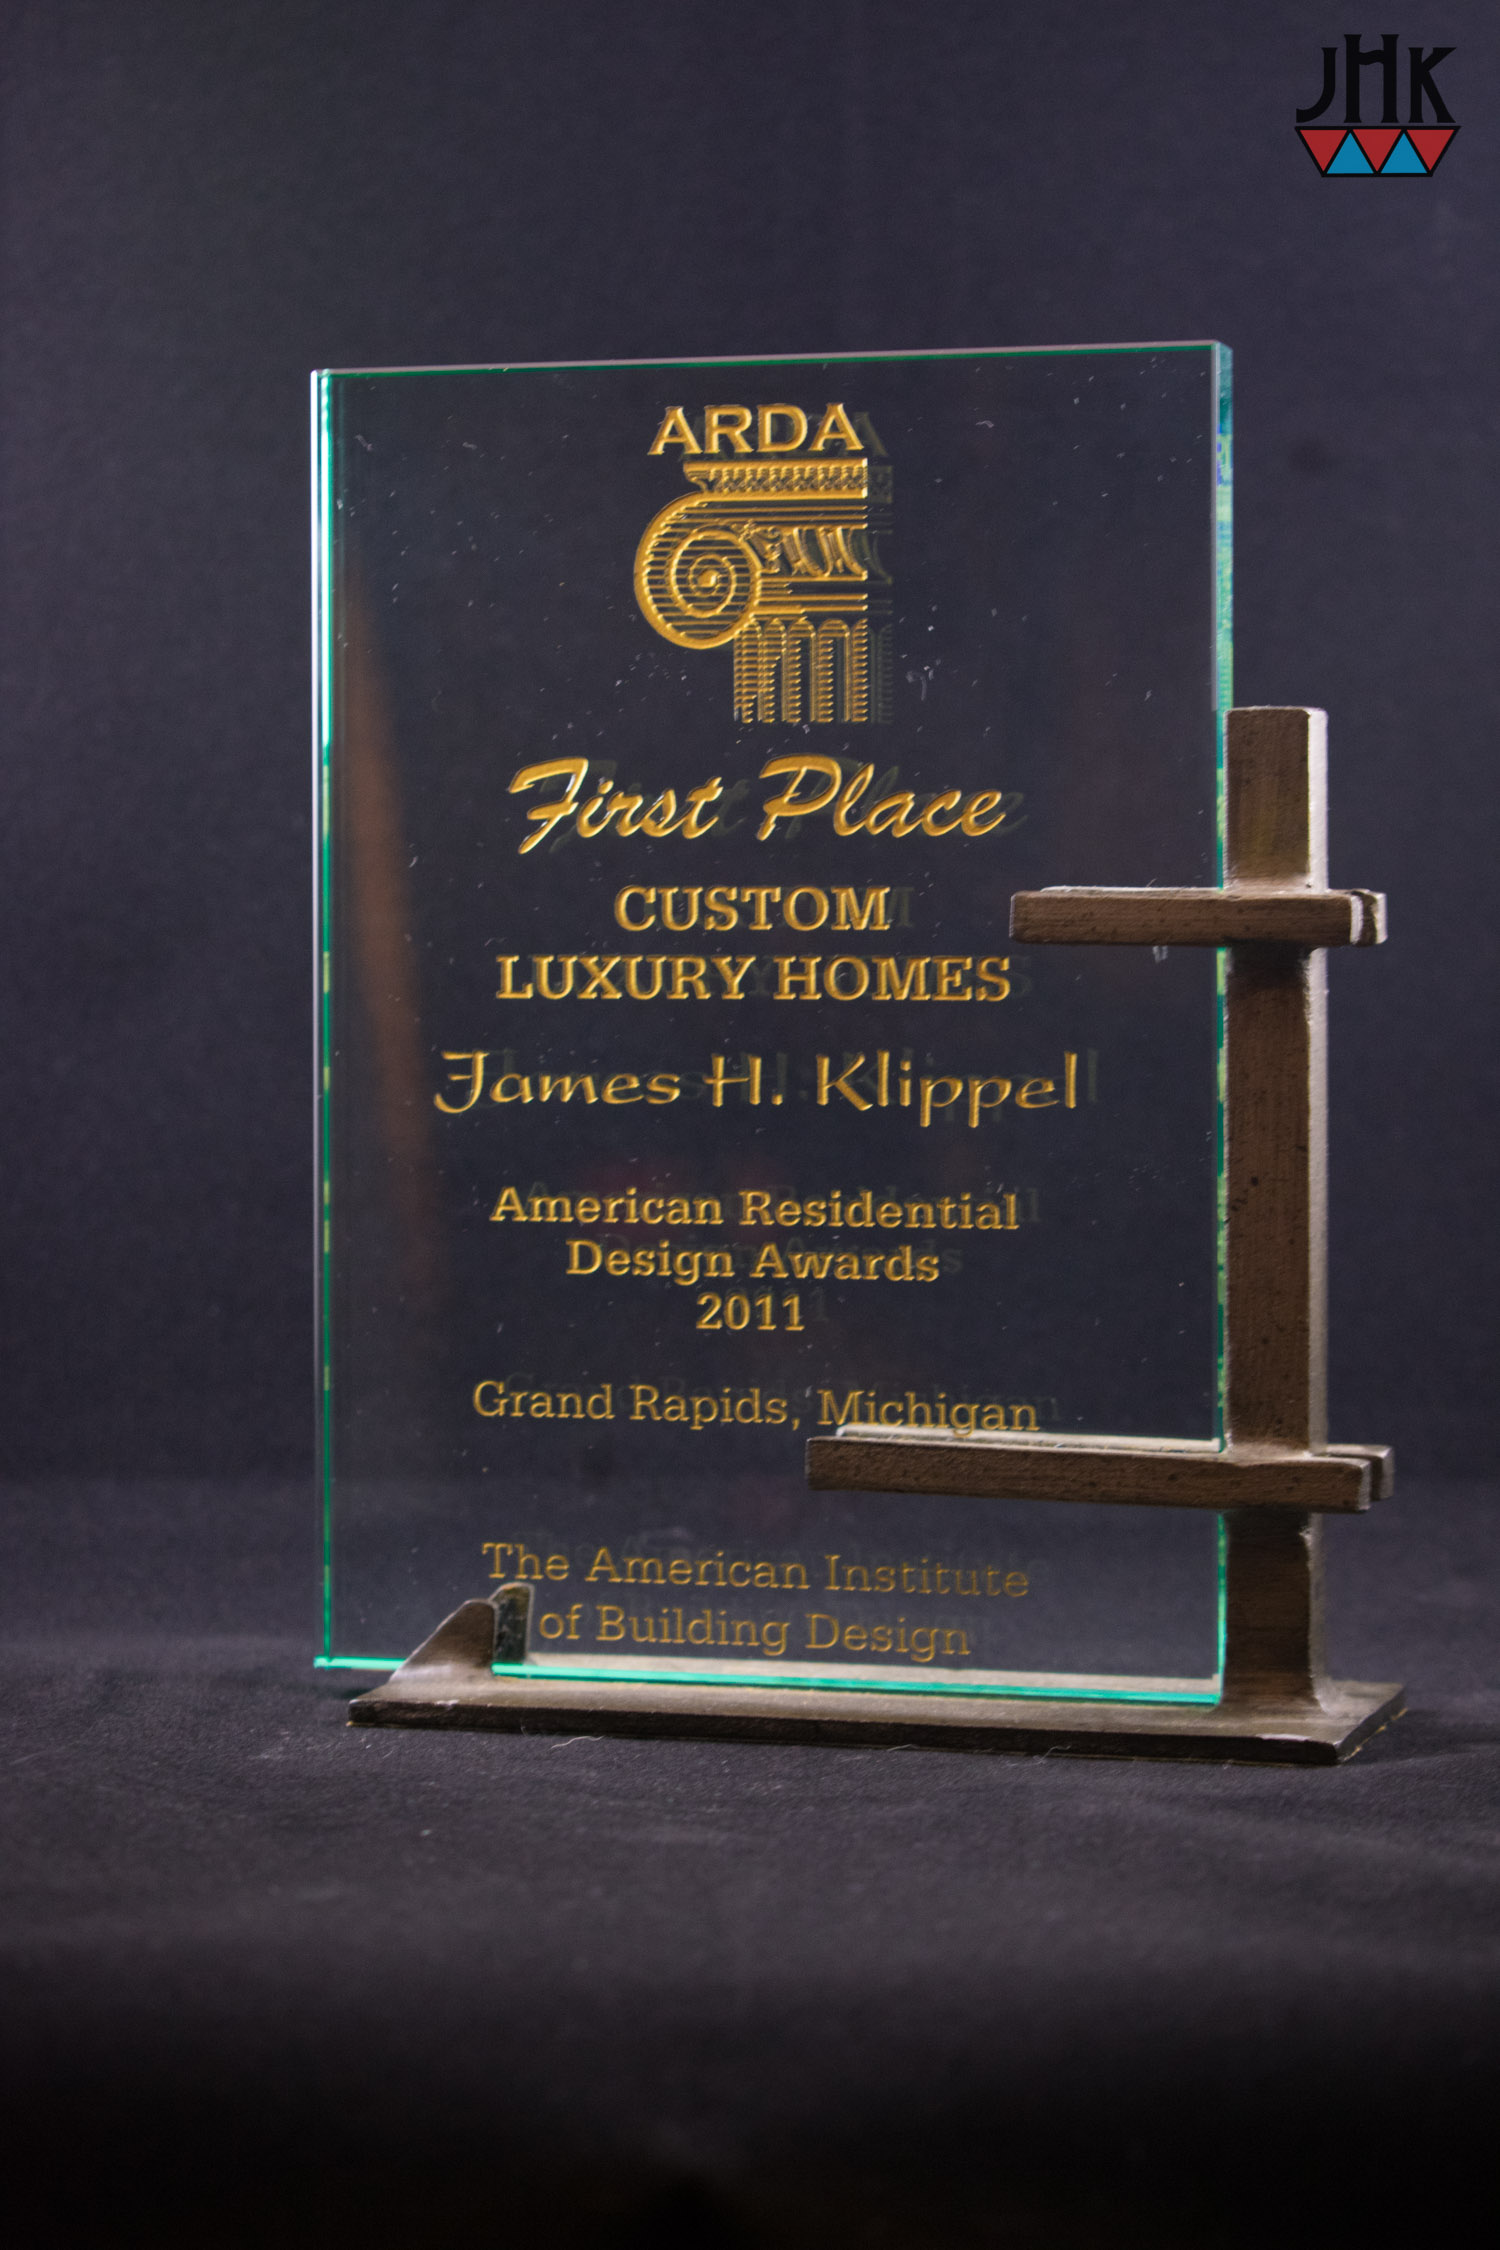 aibd arda award first place custom luxury homes grand rapids michigan jim klippel 2005-1.jpg